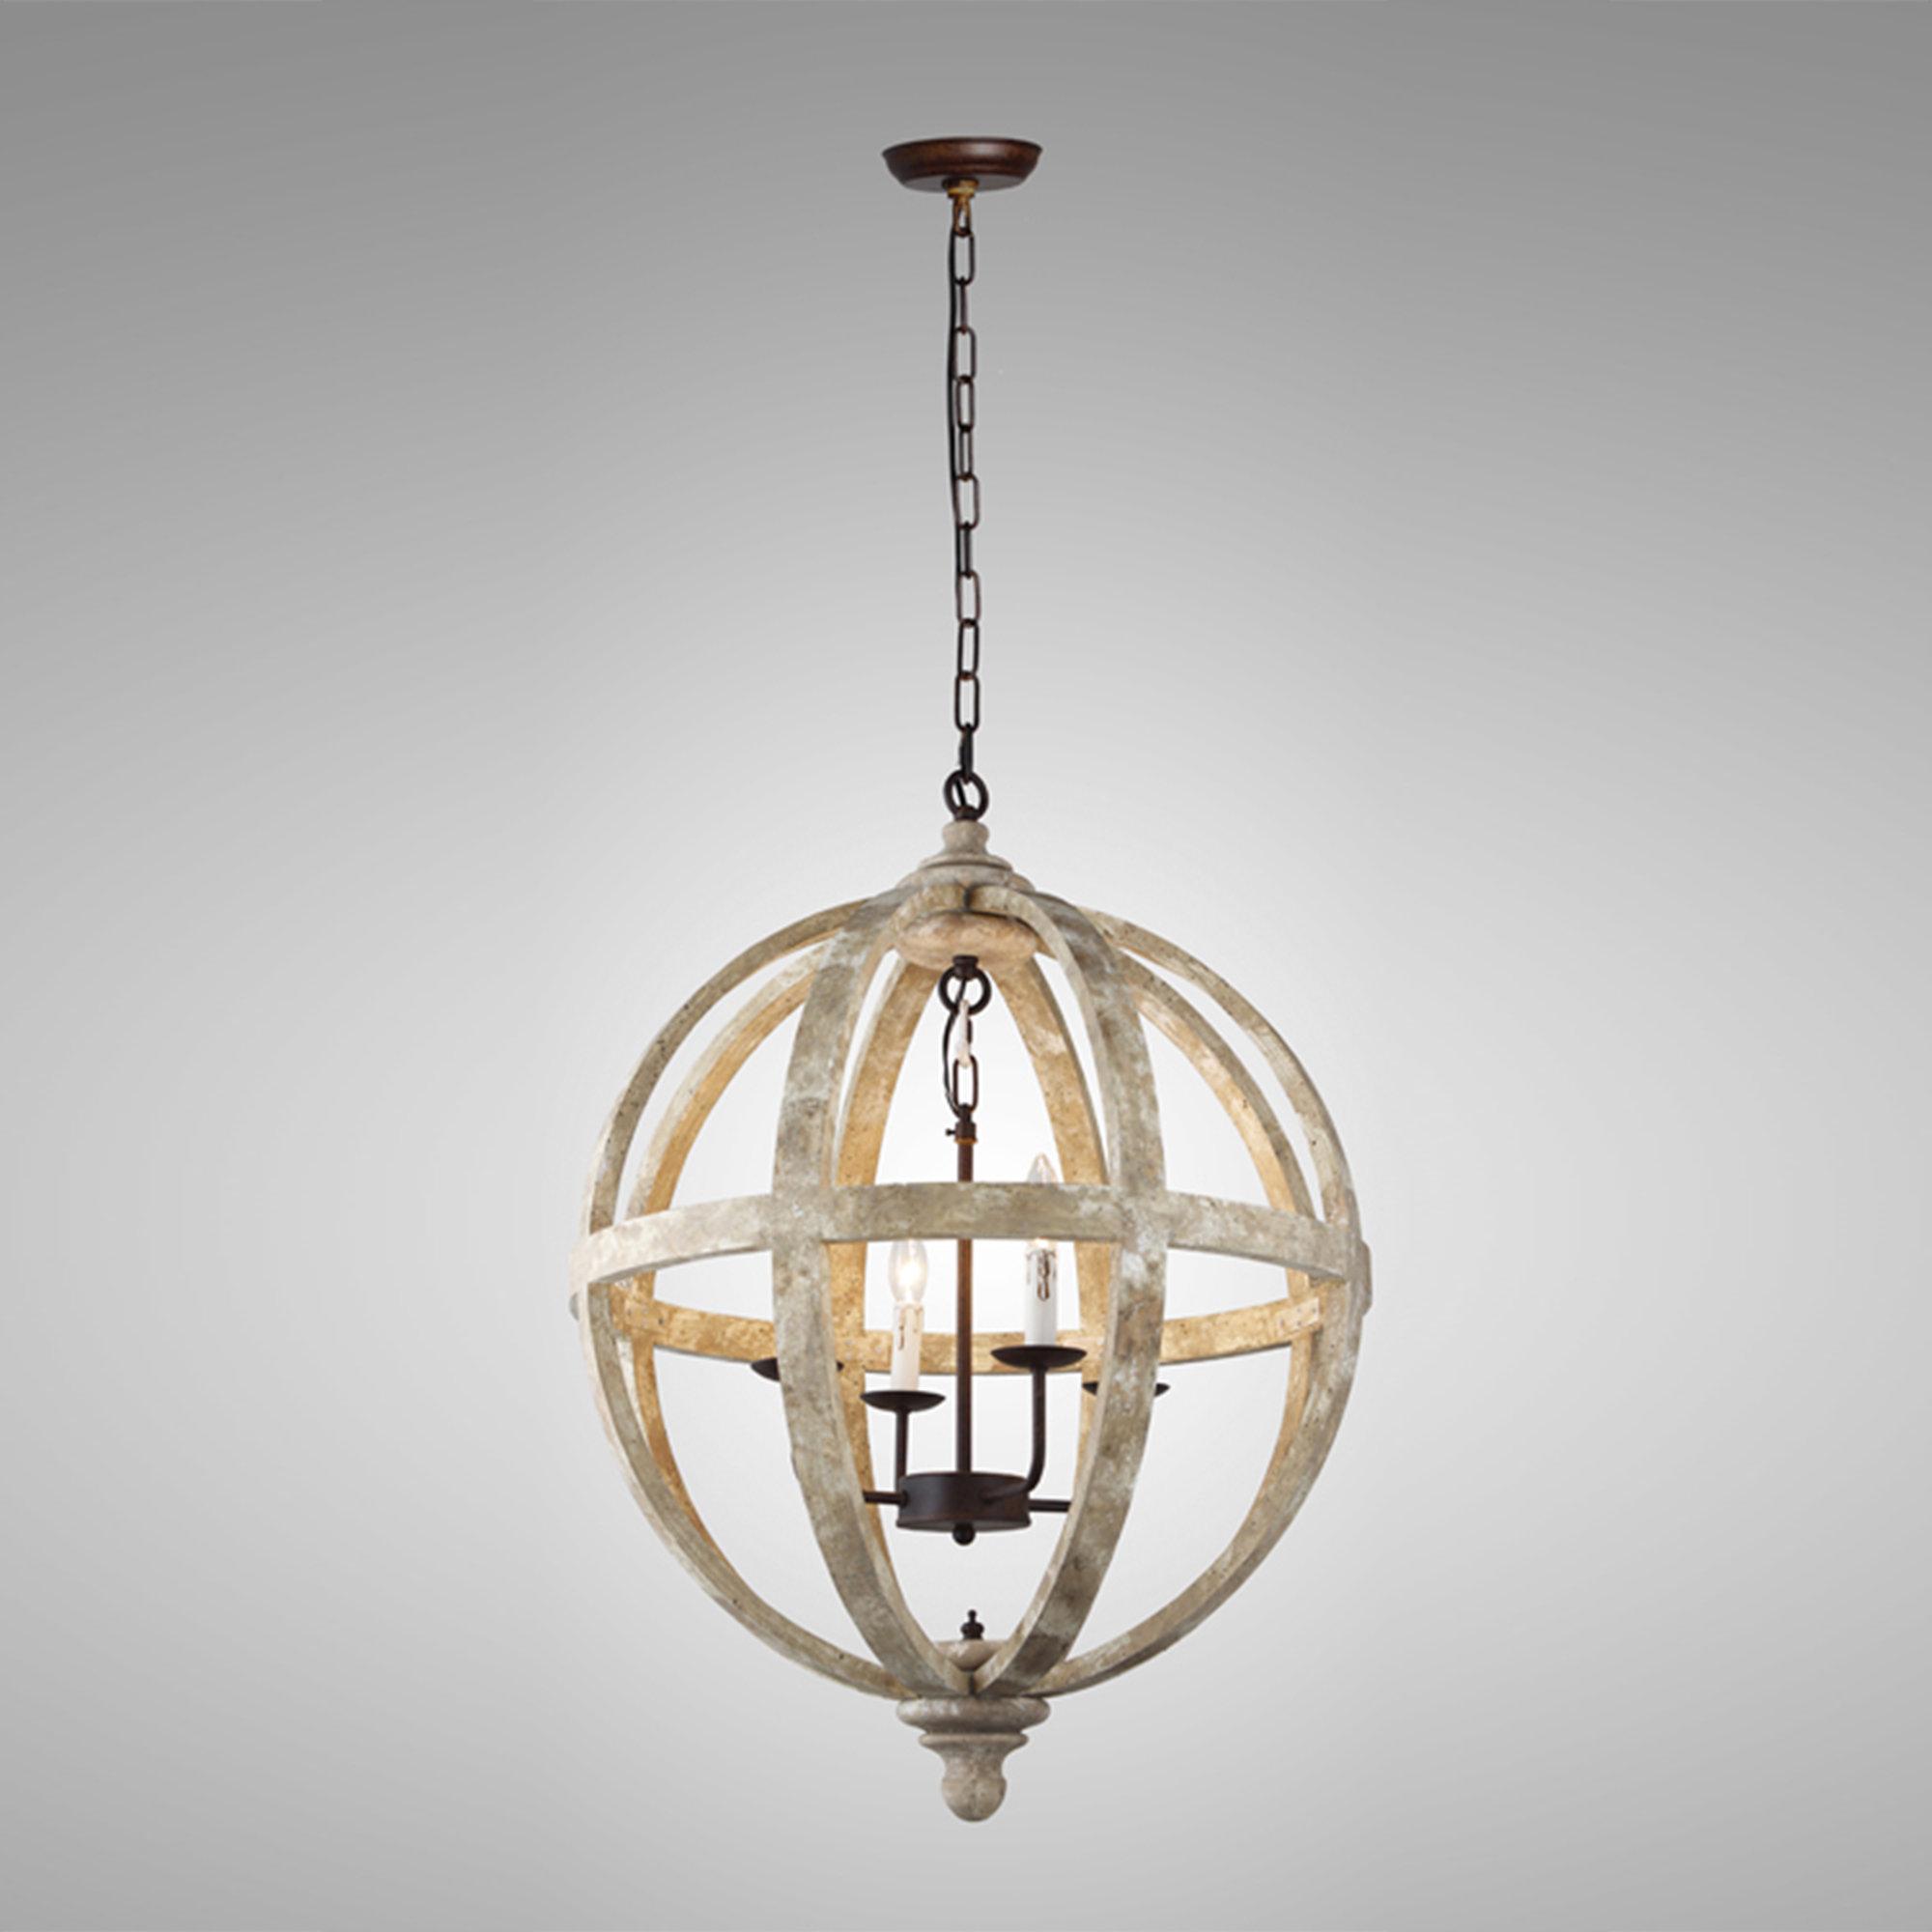 Ryne 4 Light Globe Chandelier Intended For Cavanagh 4 Light Geometric Chandeliers (View 15 of 30)